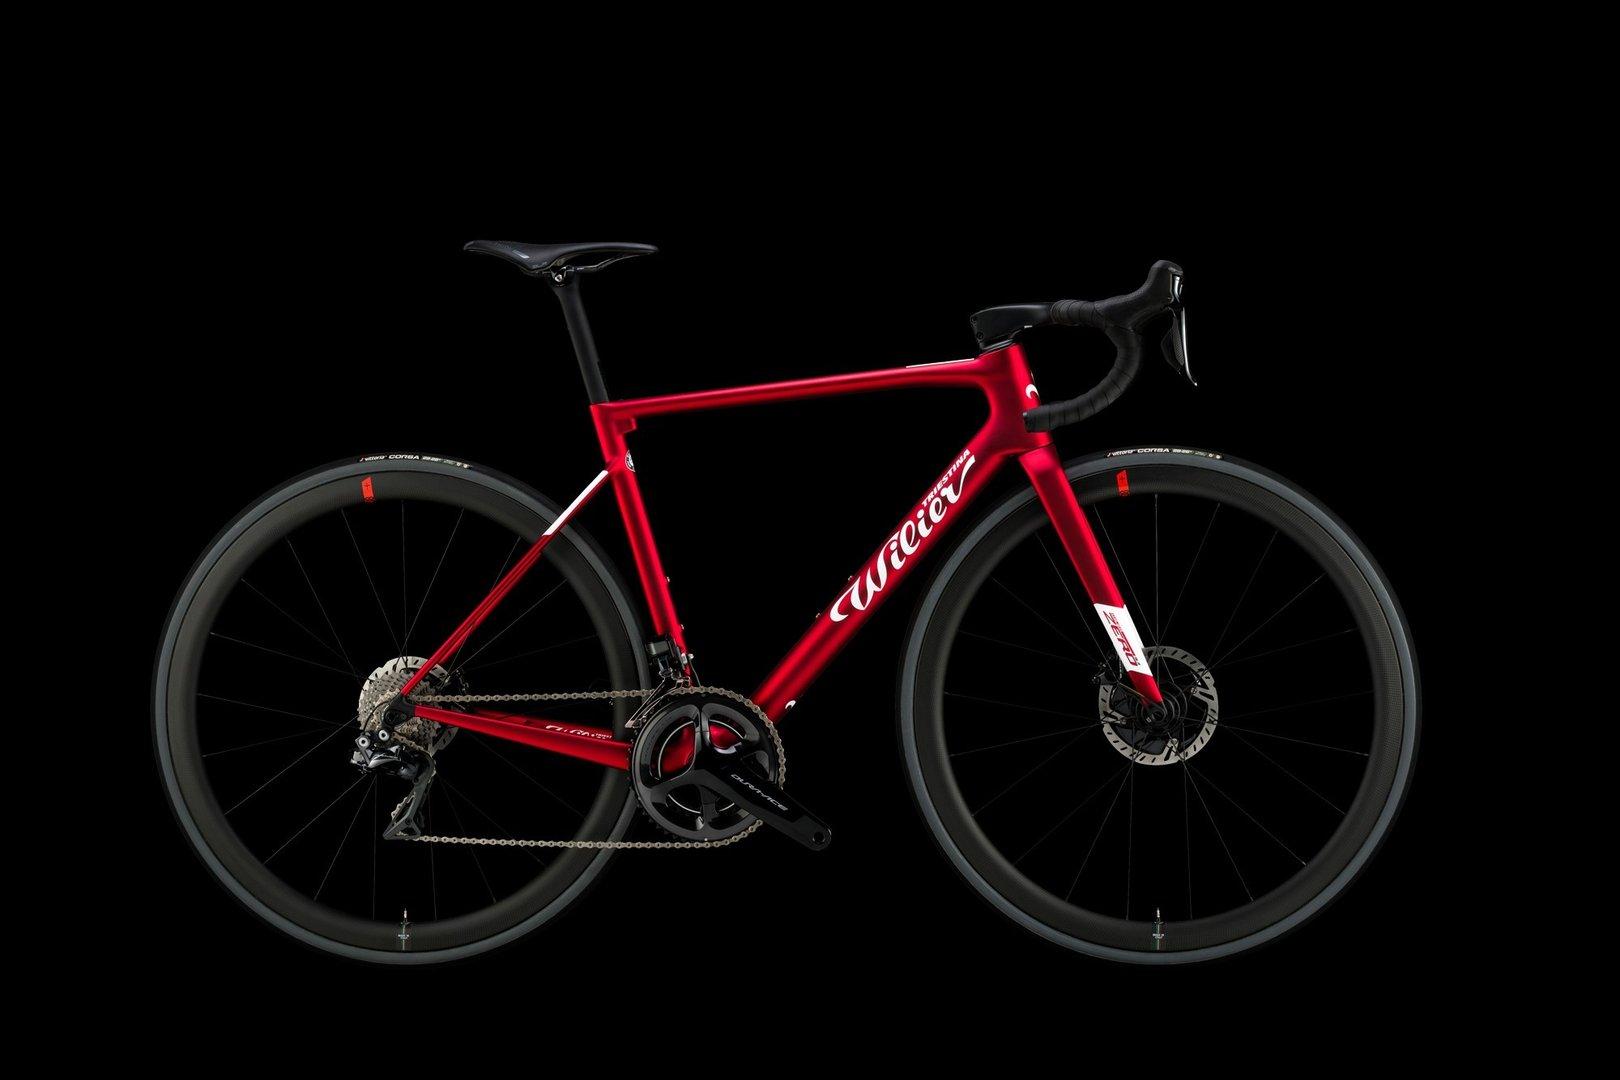 wilier zero slr 2020. Ristorocycles vendita bici wilier a Pinerolo, Torino